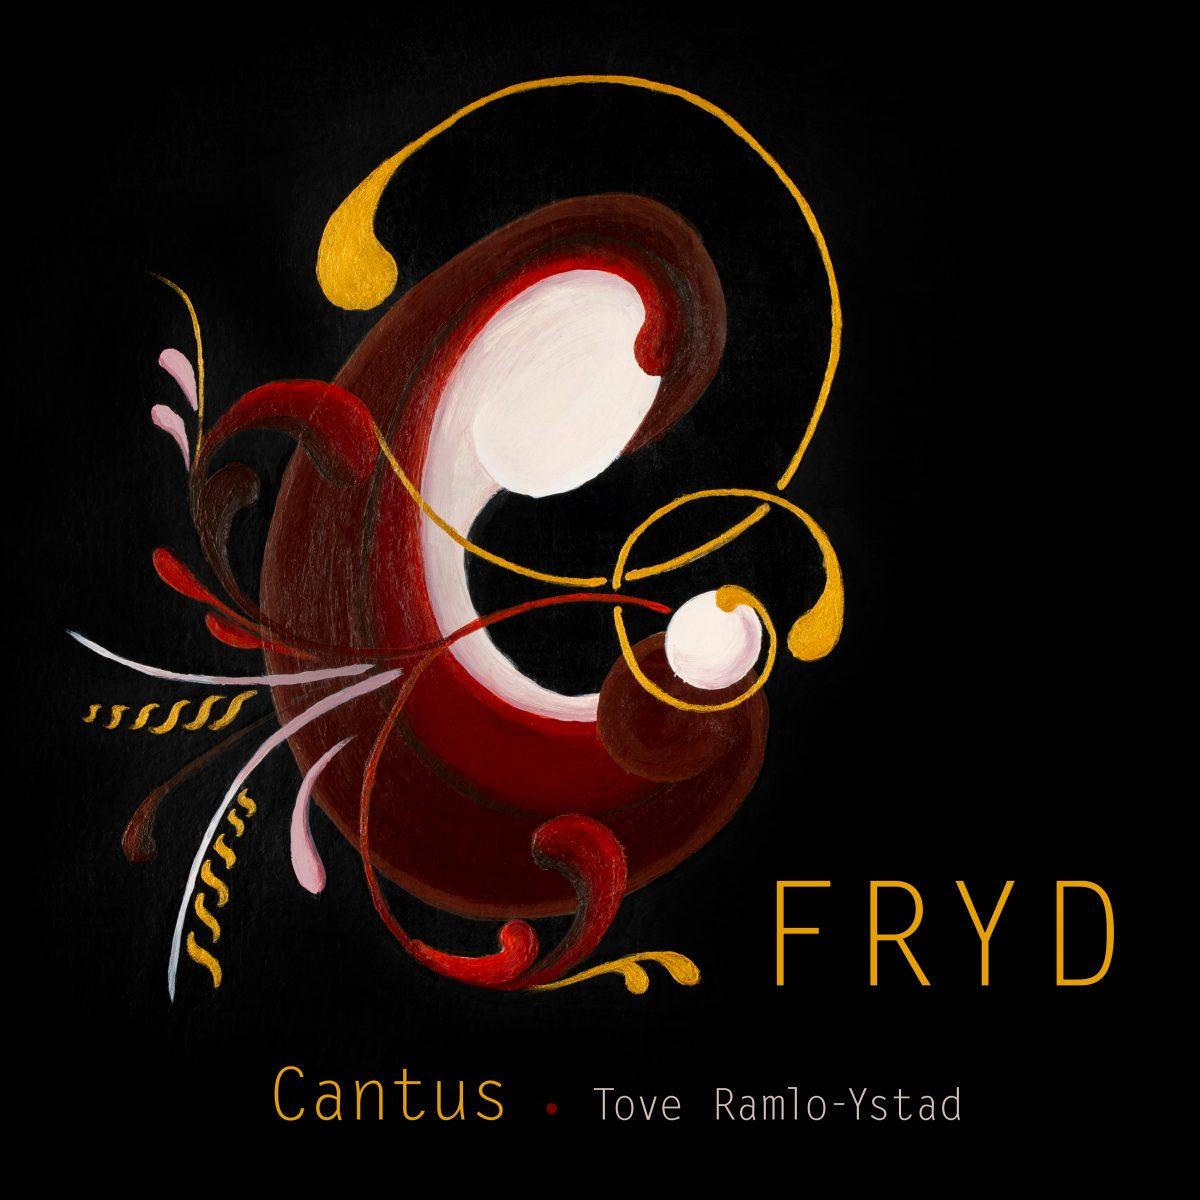 Tove Ramlo-Ystad, Fryd | The Vinyl Anachronist